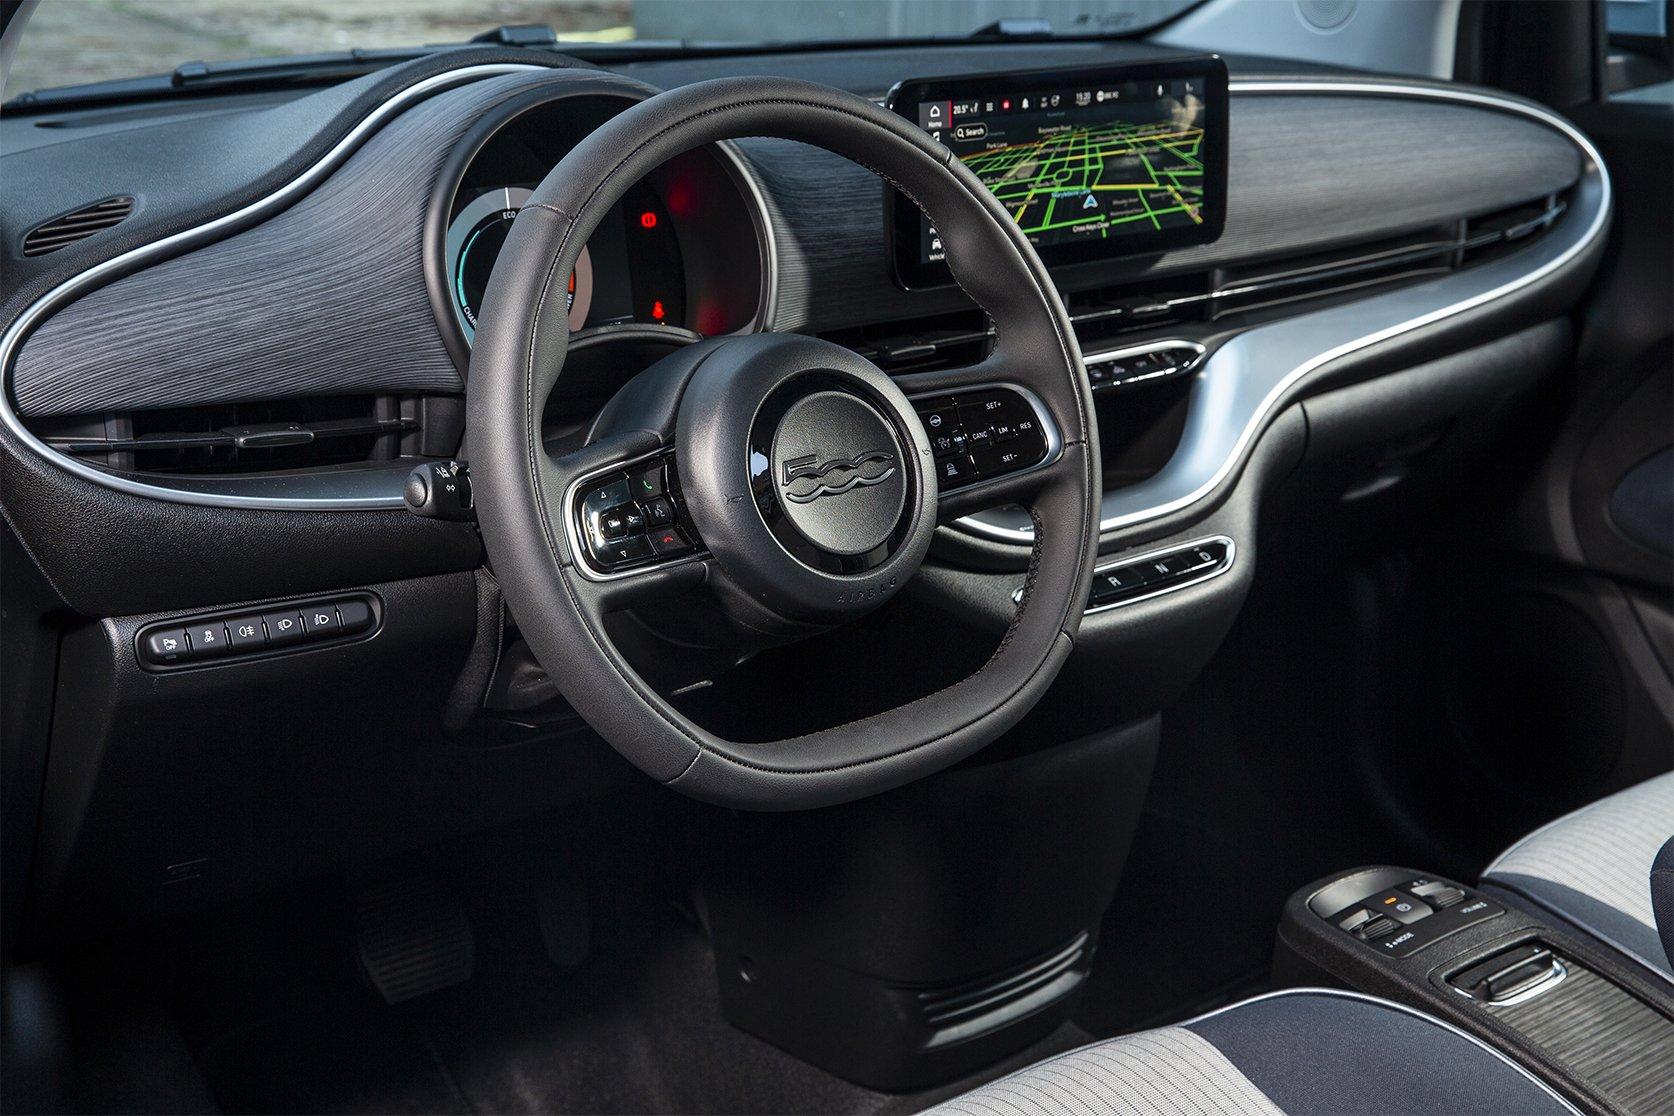 novo fiat 500e volante e interior